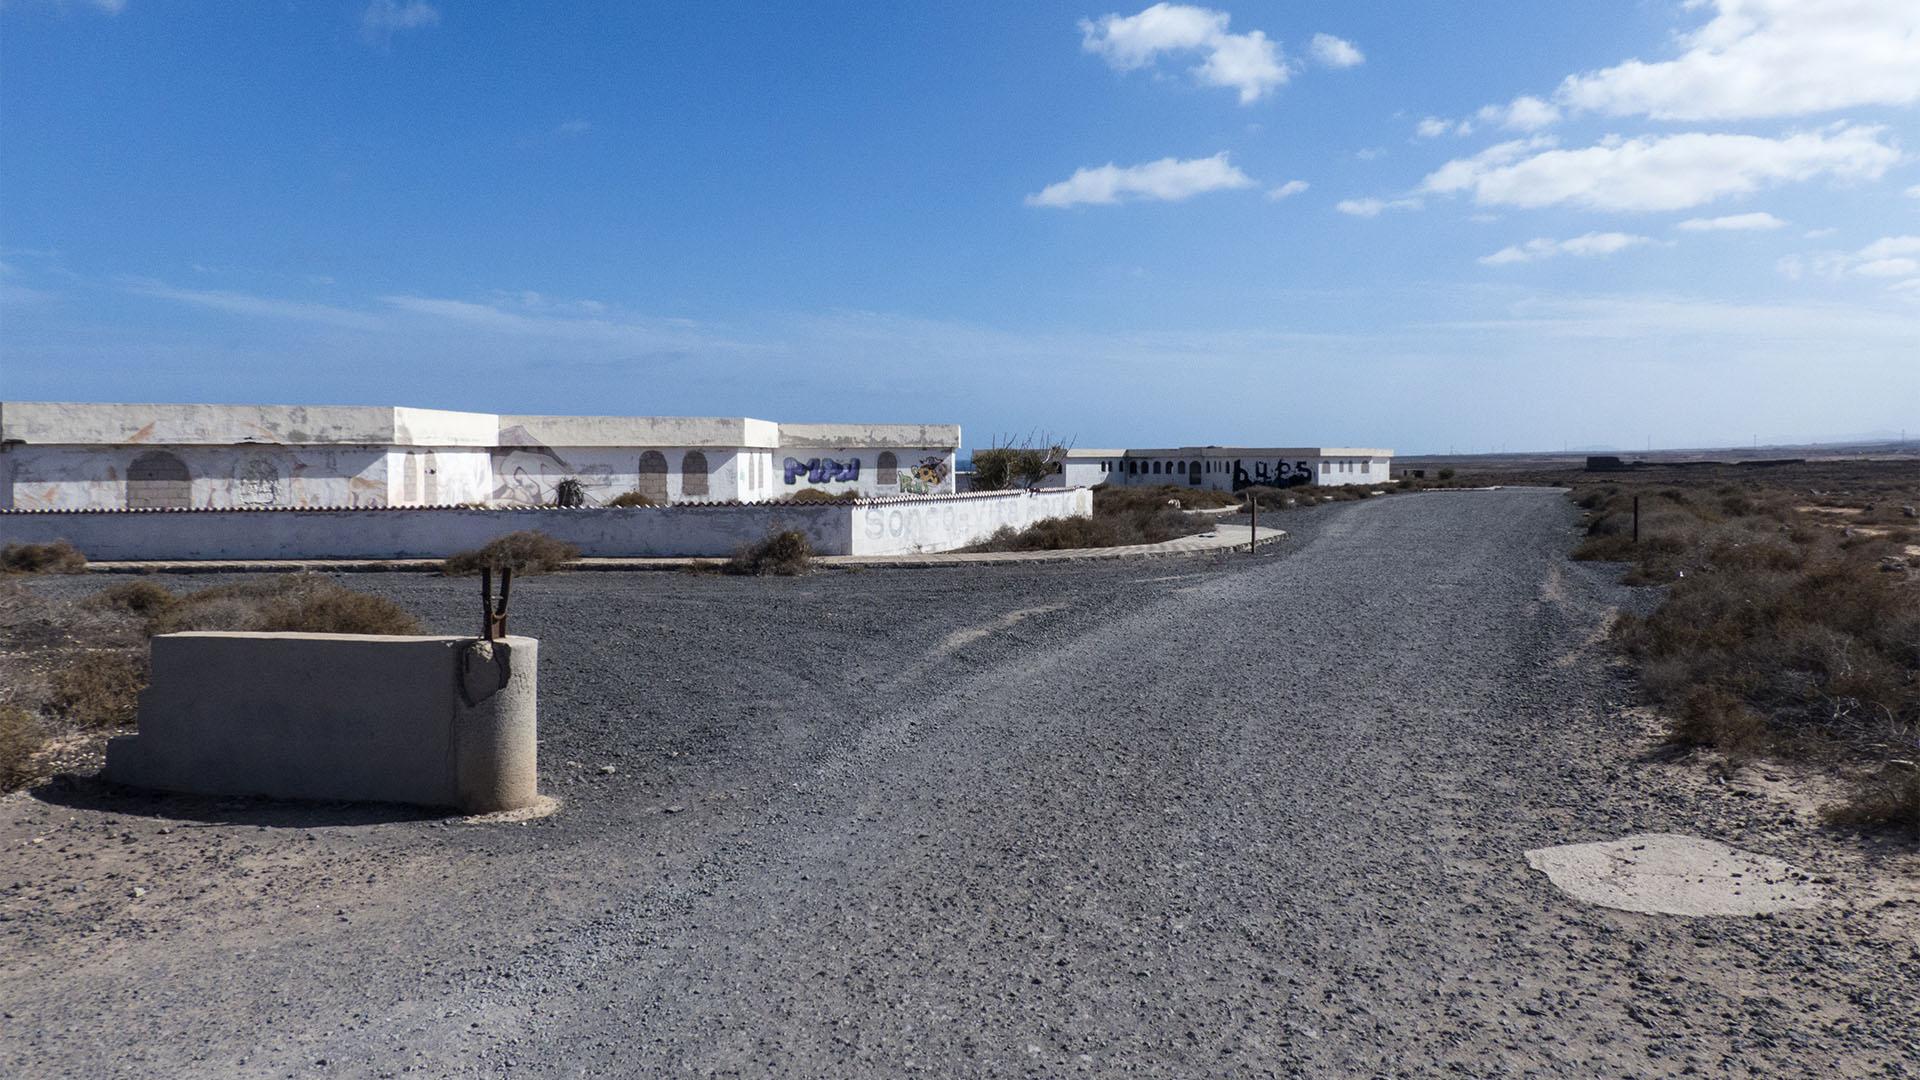 Die Strände Fuerteventuras: Playa del Jablito